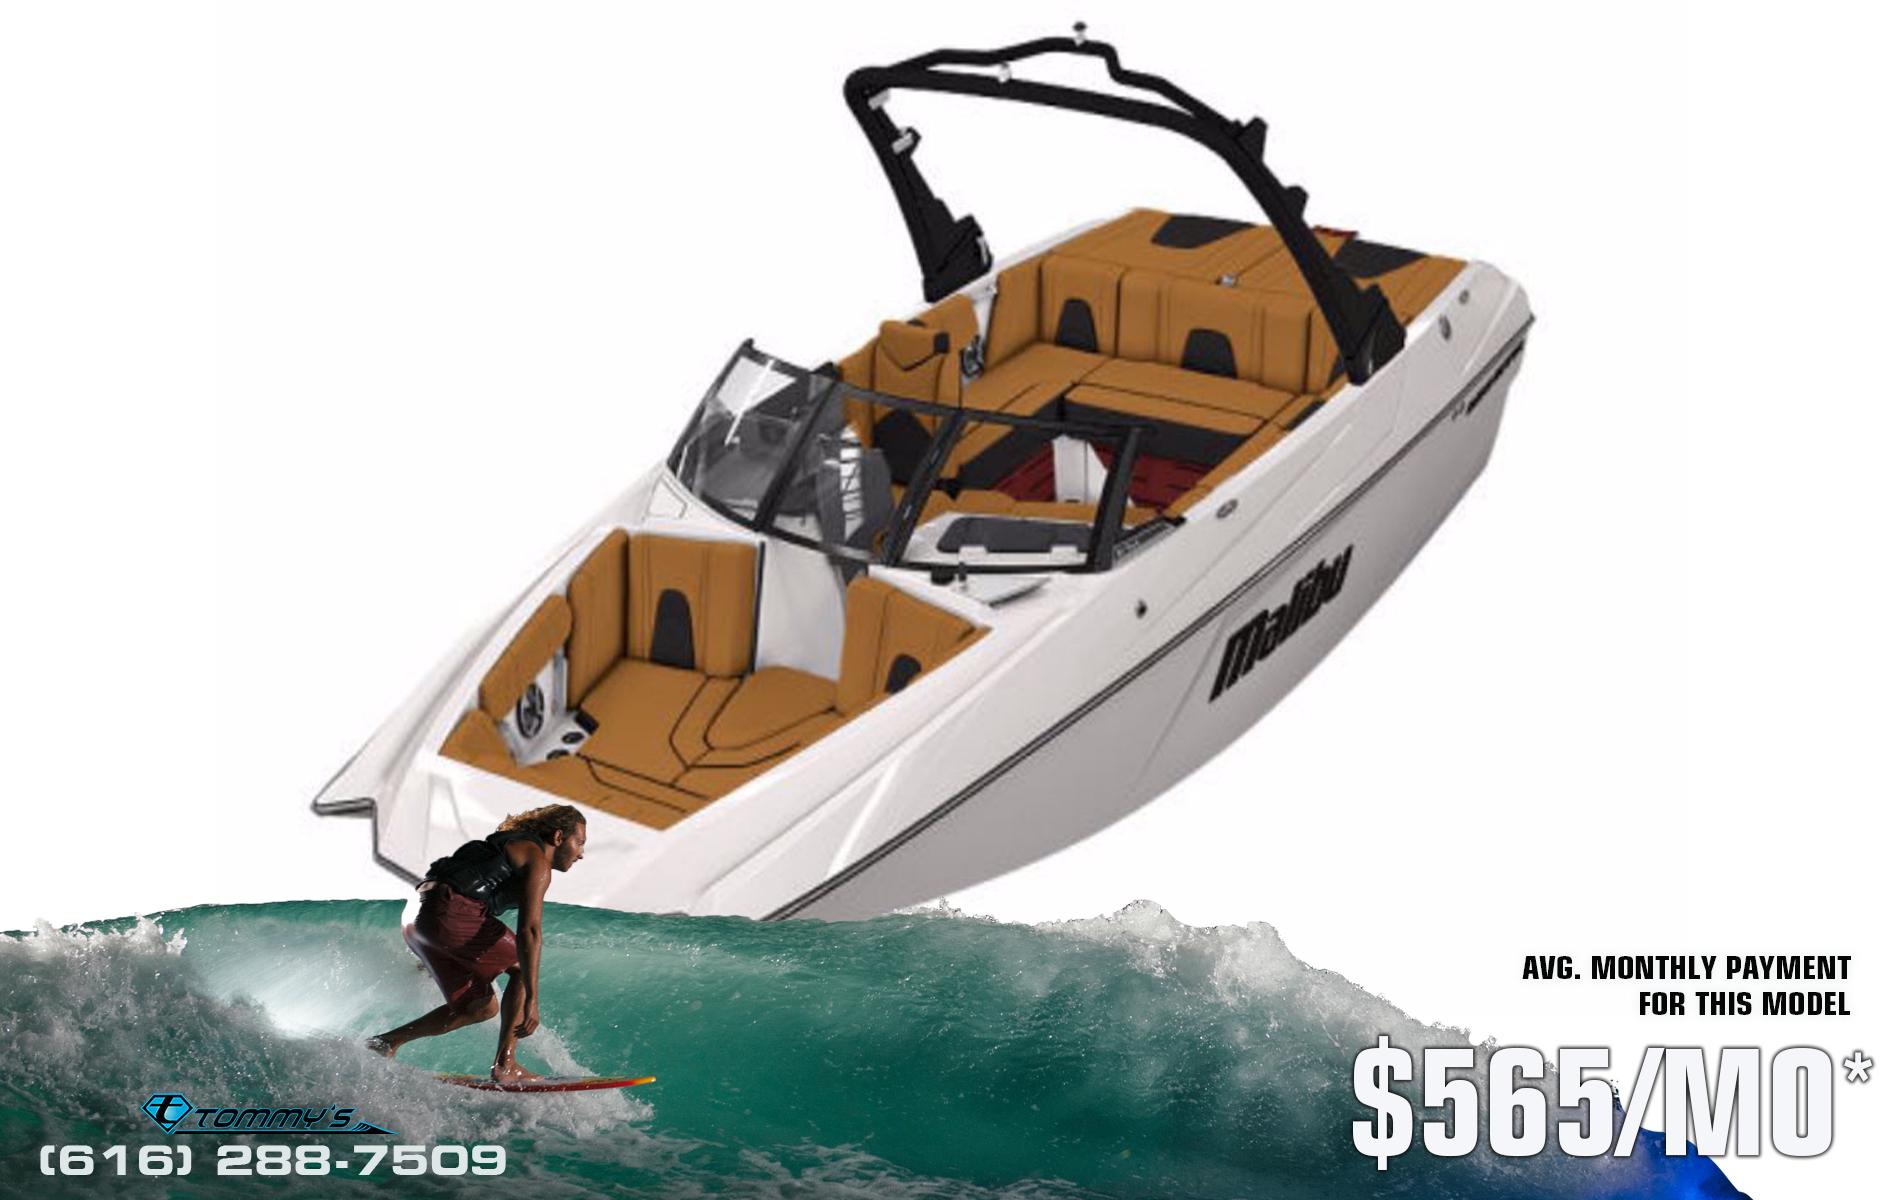 2021 Malibu 21 MLX